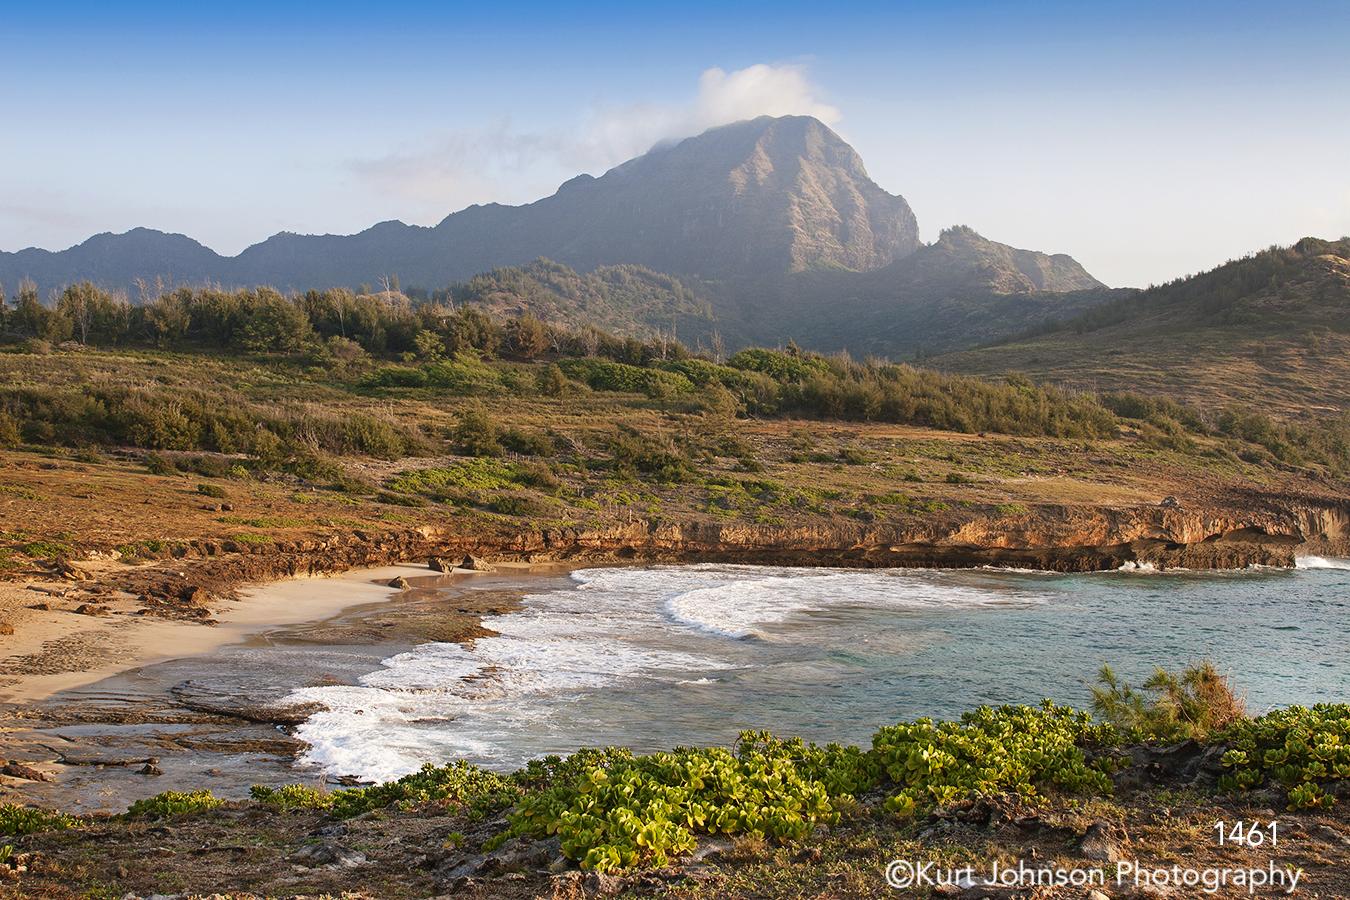 hawaii landscape waterscape mountain beach waves hawaii